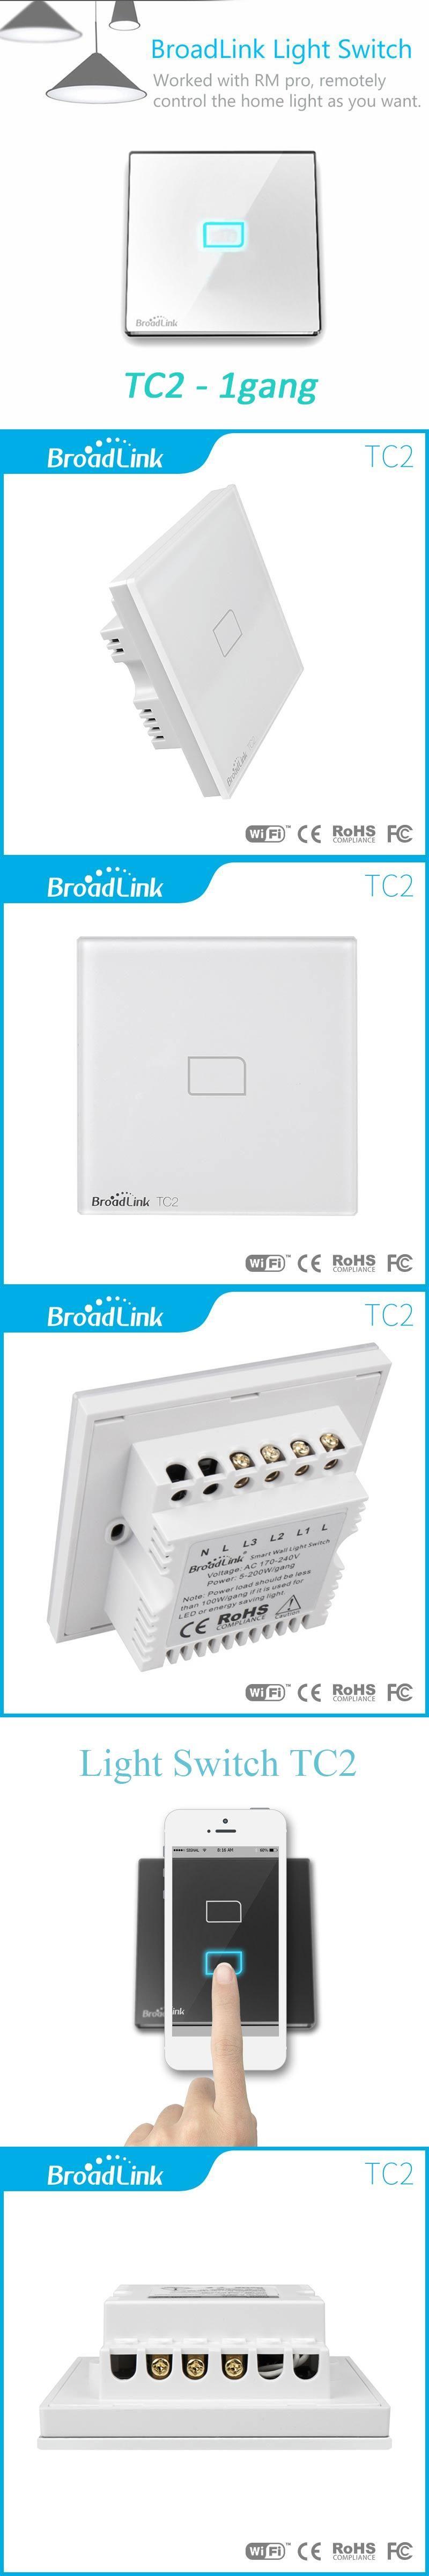 Uk standard broadlink tc2 wireless 1 gang wall light switch wifi uk standard broadlink tc2 wireless 1 gang wall light switch wifi remote control touch screen switch aloadofball Images